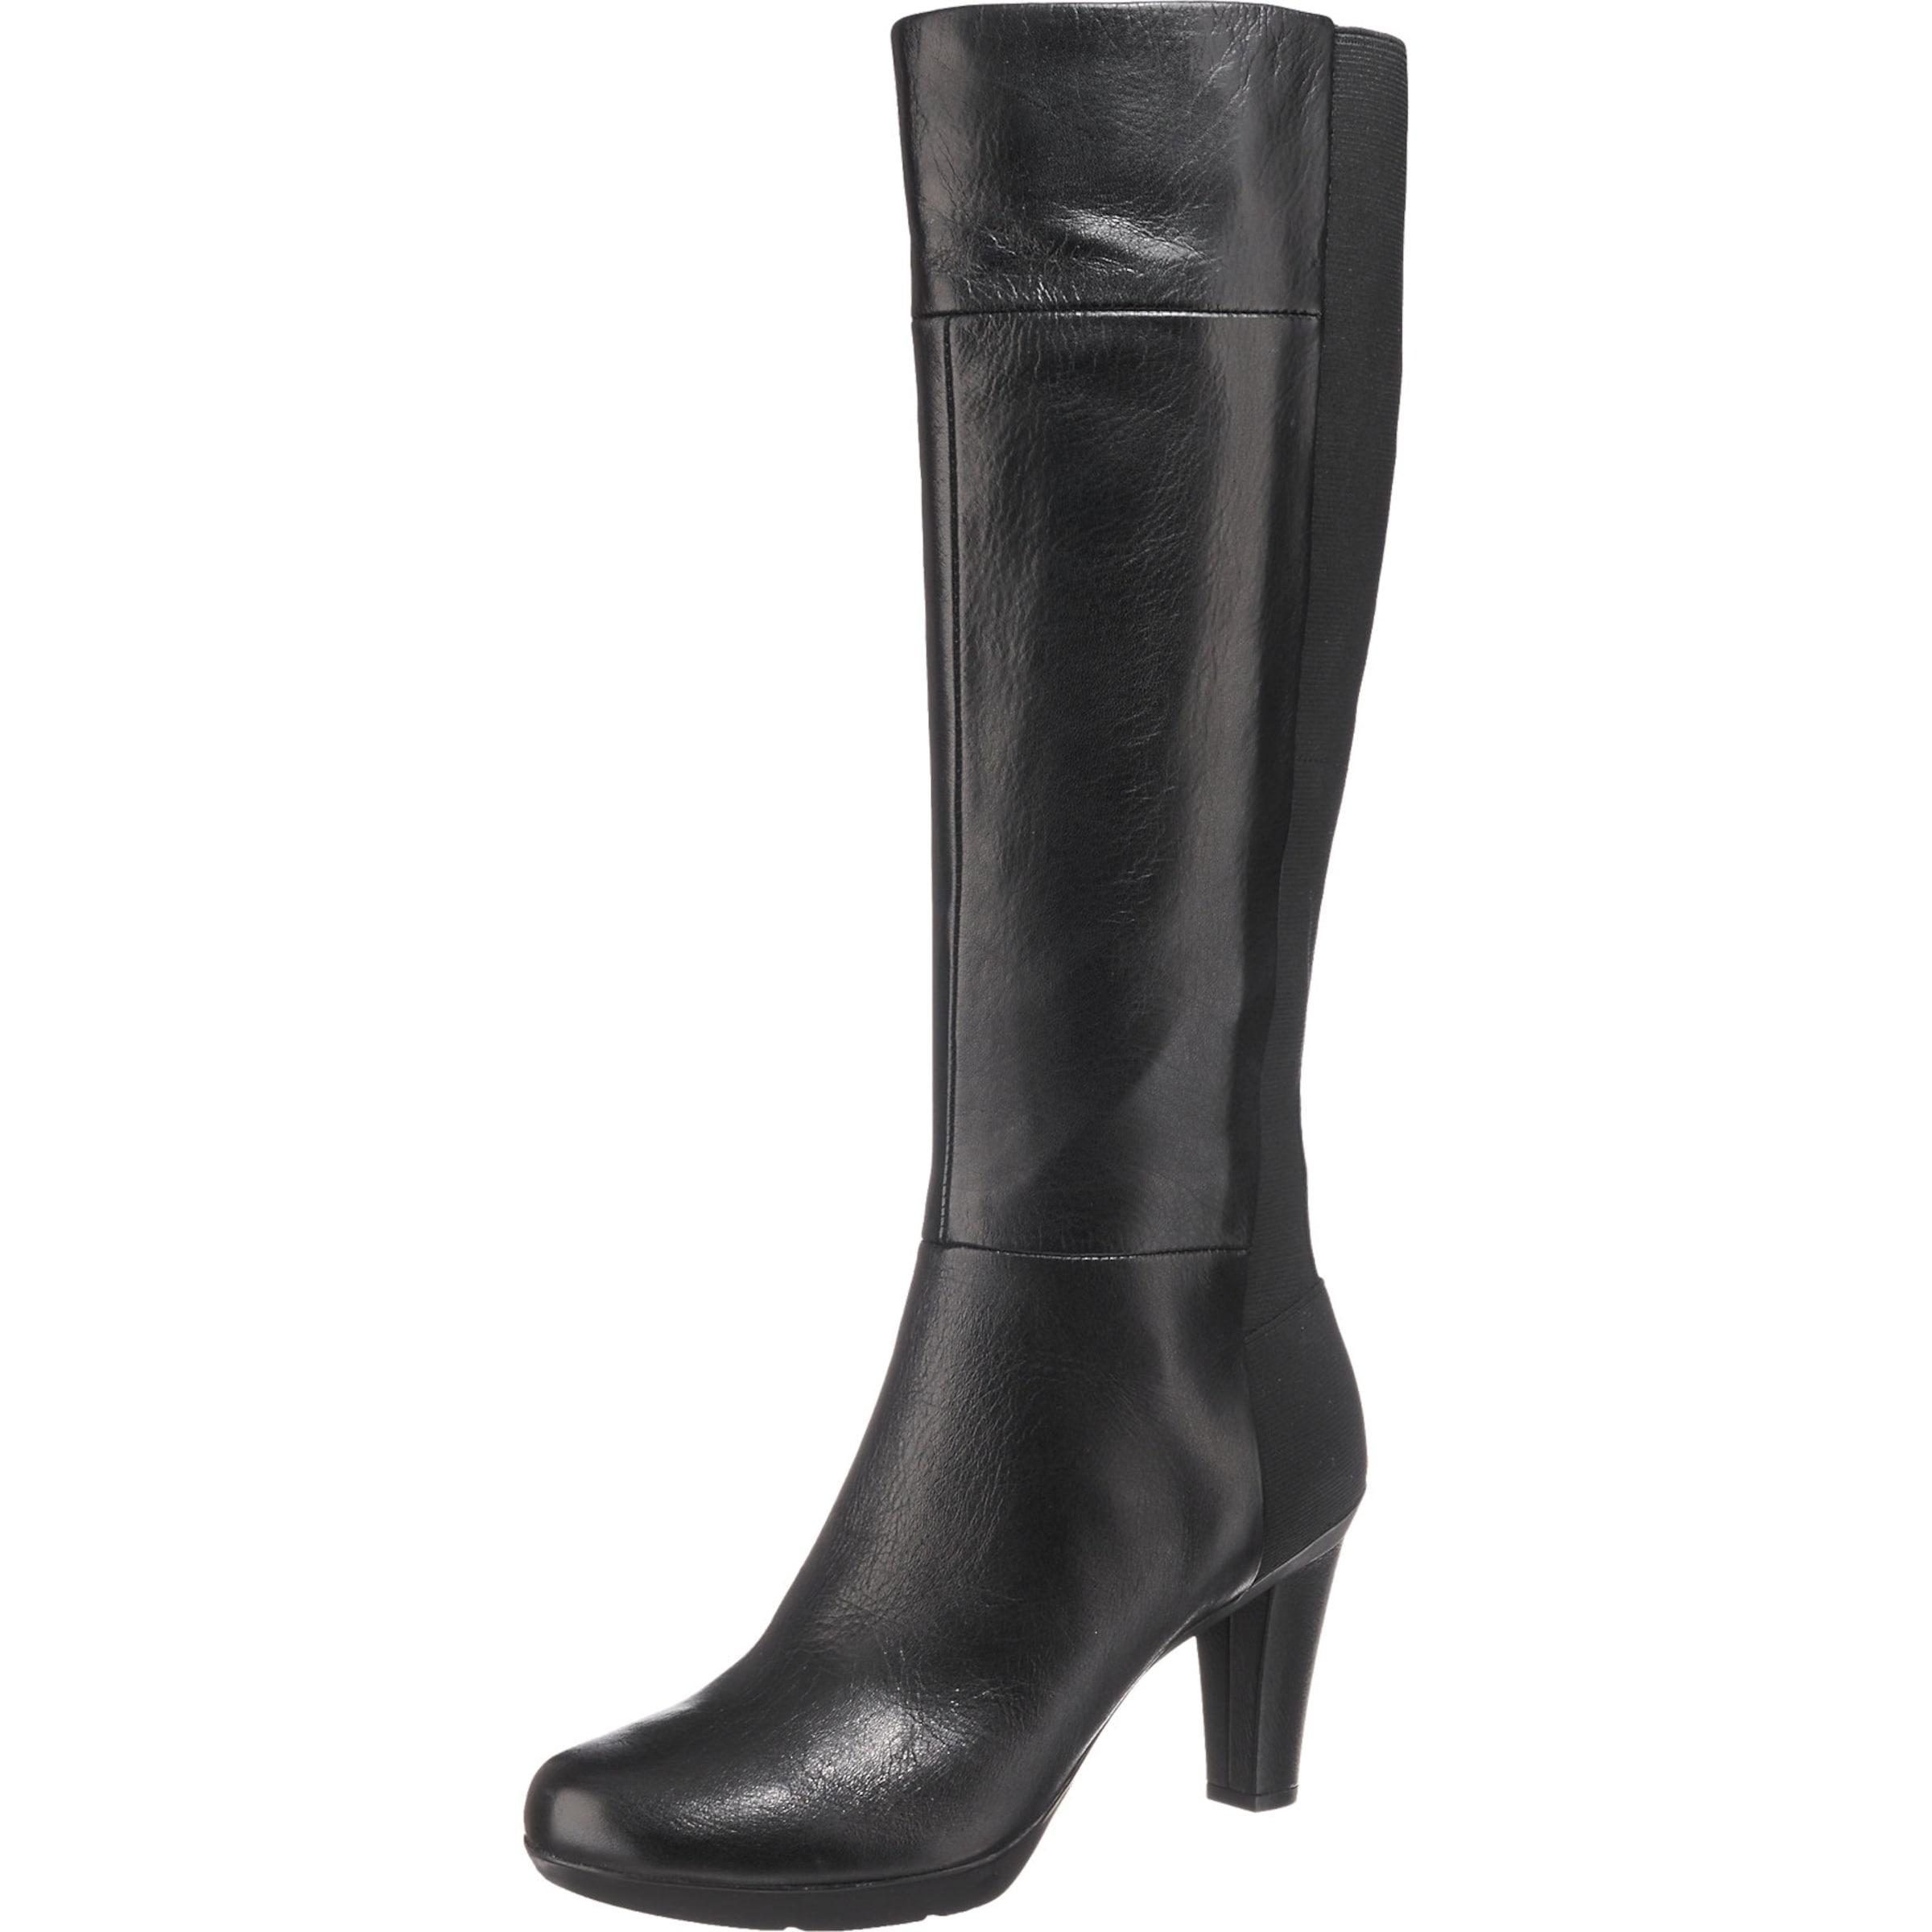 Haltbare Mode billige Schuhe GEOX | 'Inspirat' Stiefel Schuhe Gut getragene Schuhe